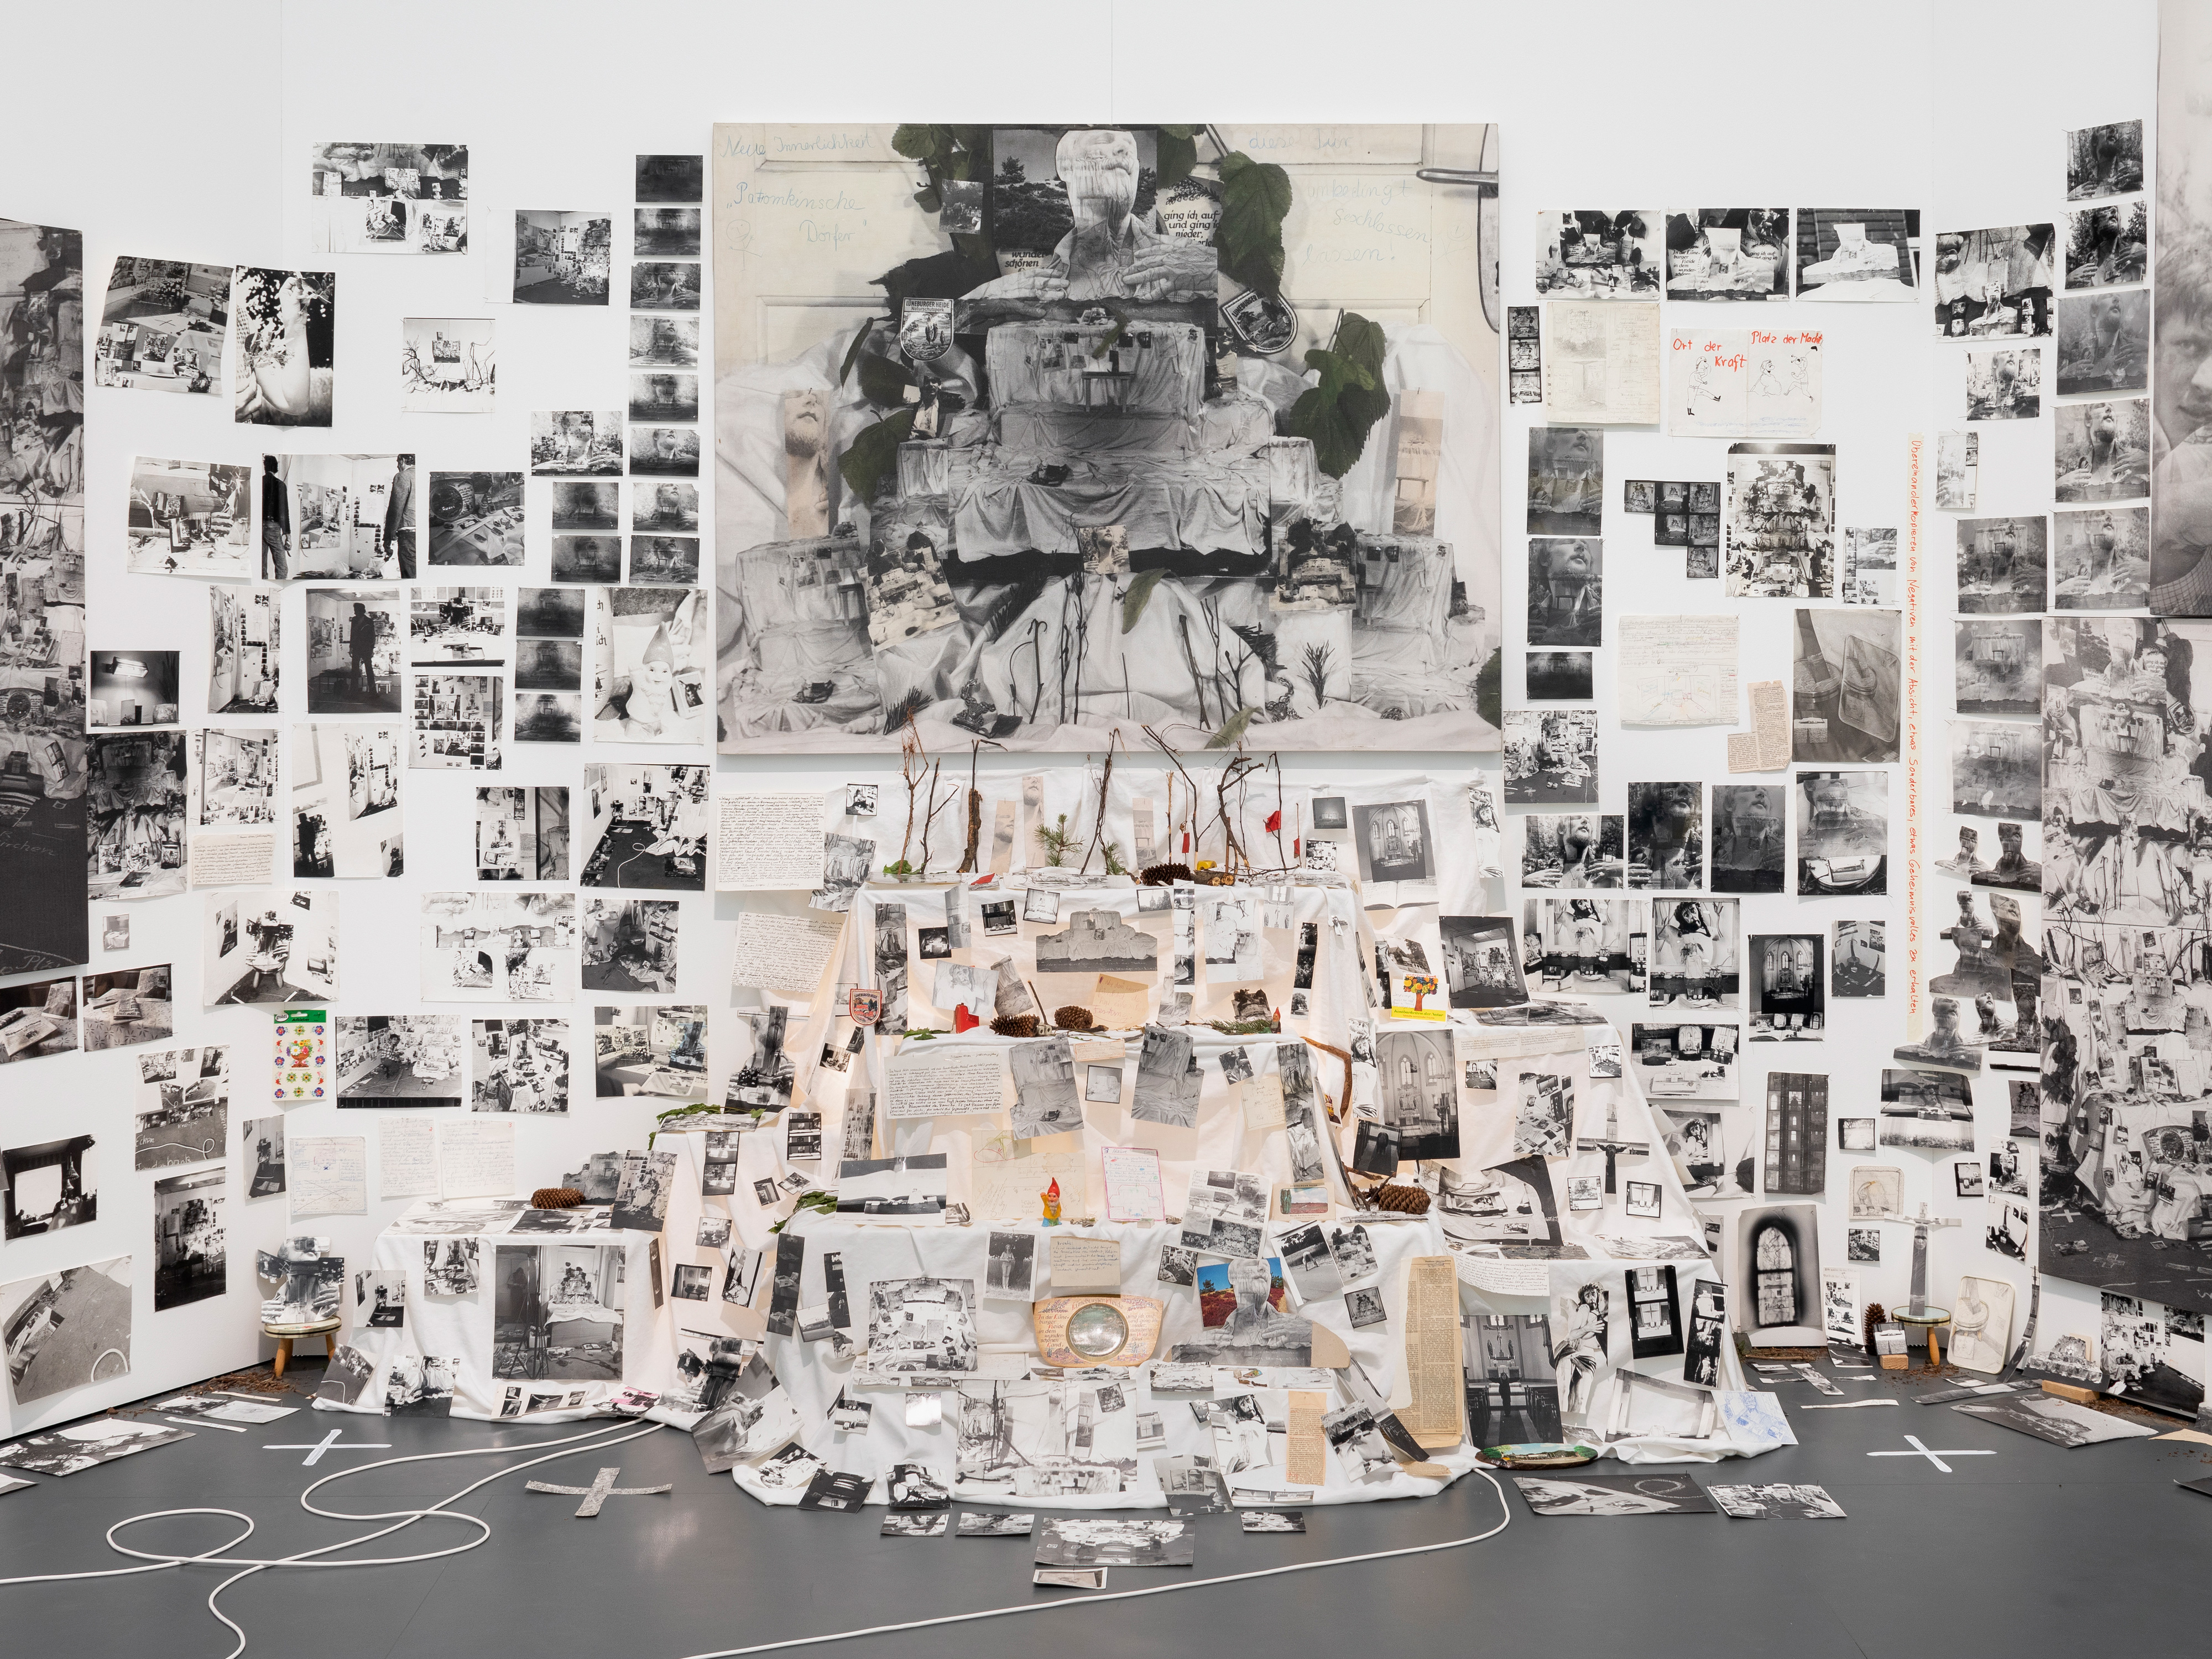 Galerie Barbara Thumm \ Anna Oppermann – Glaube (Group show)